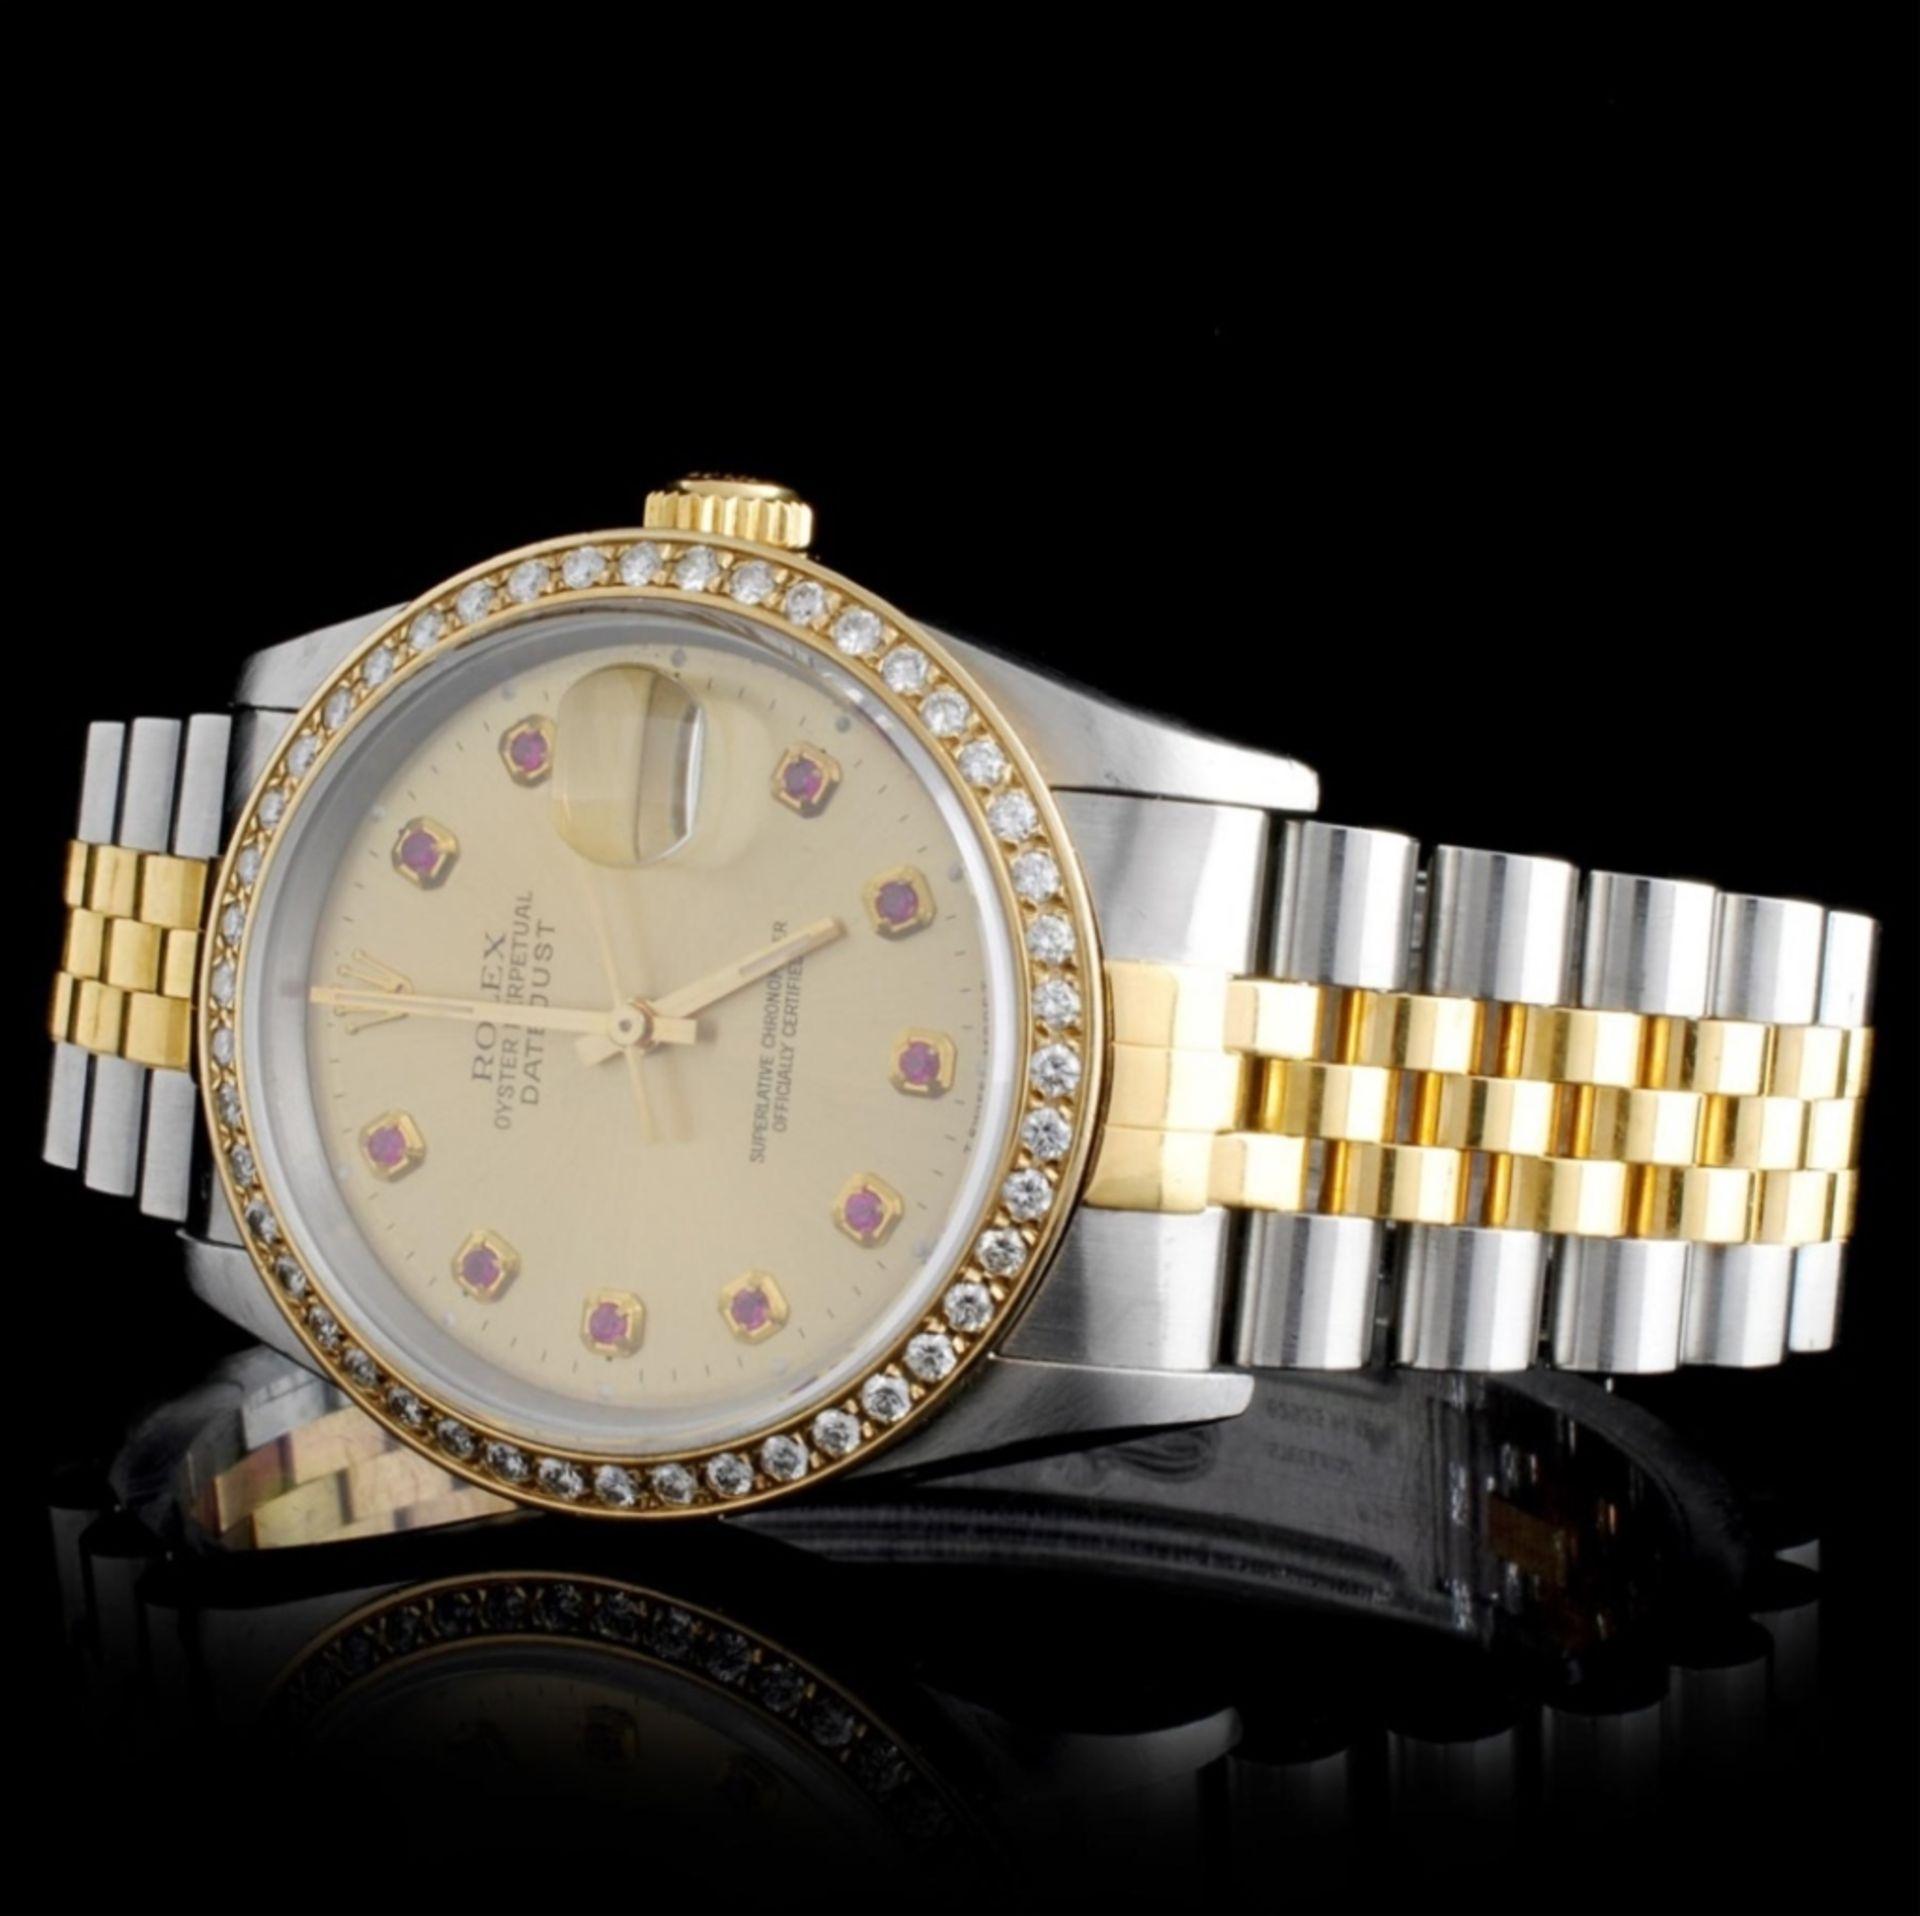 Rolex YG/SS DateJust 1.50ct Diamond 36MM Watch - Image 2 of 4